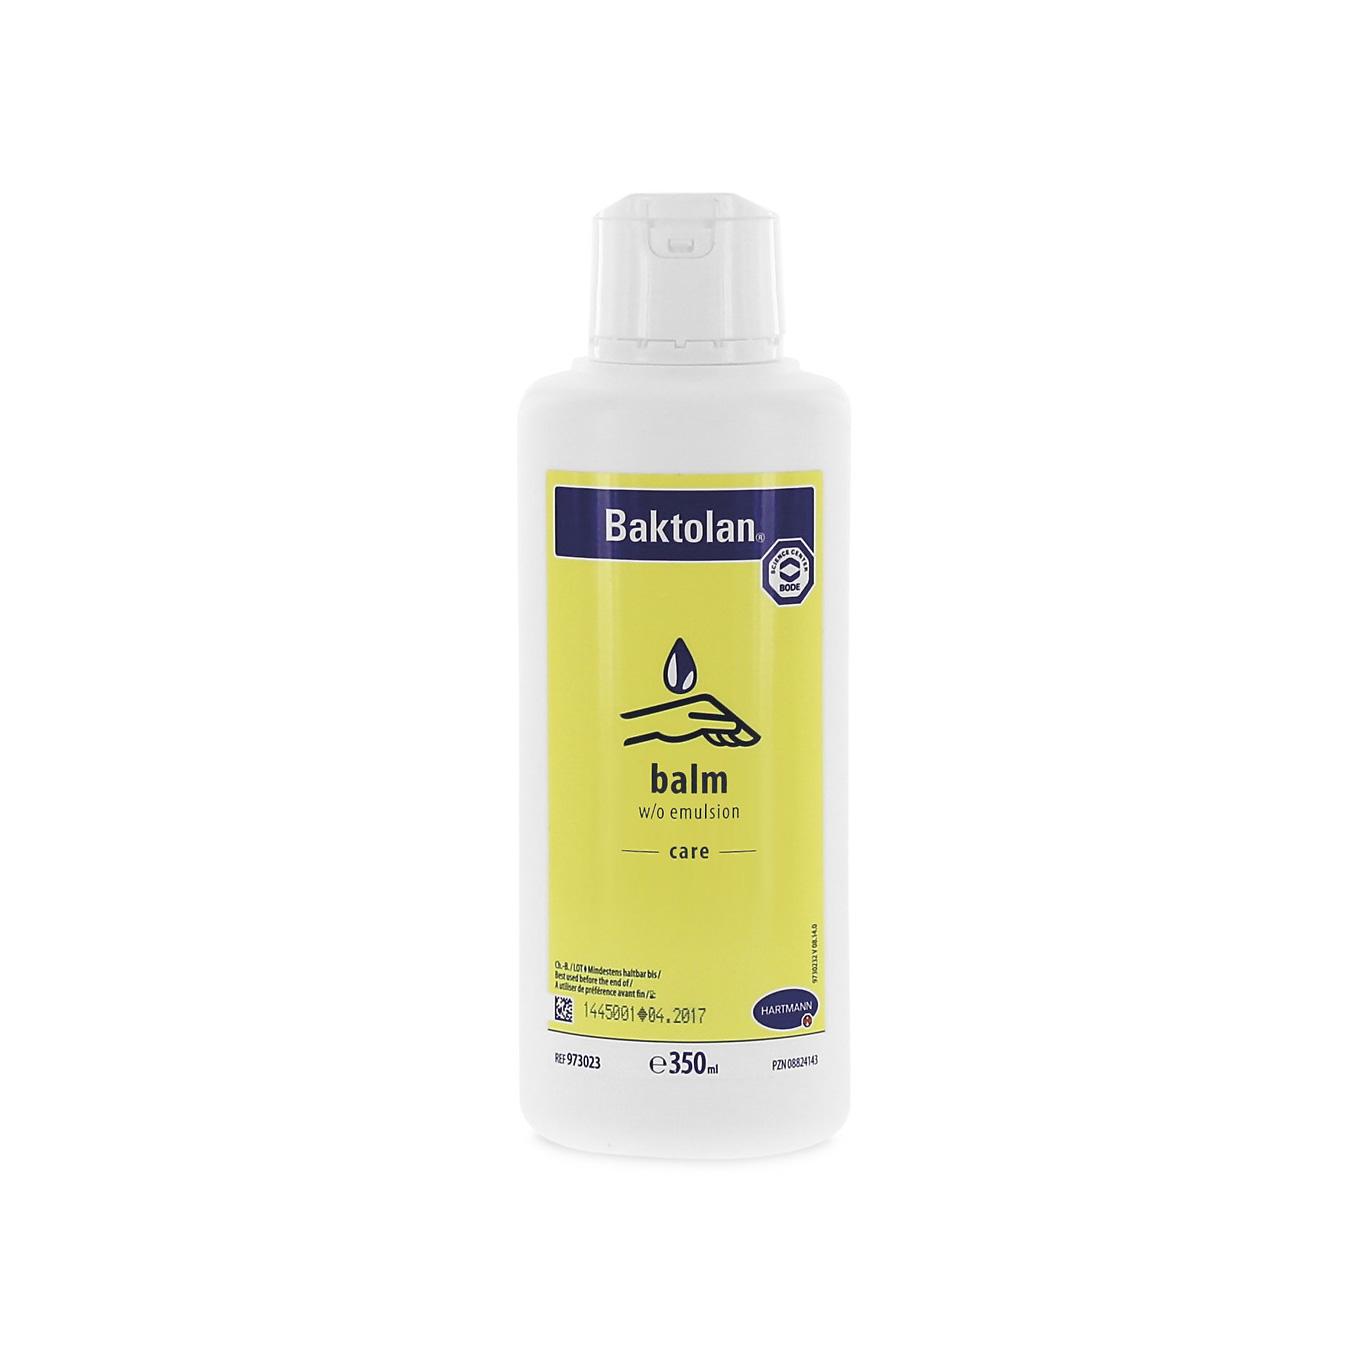 Baktolan® balm, 350 ml-Flasche